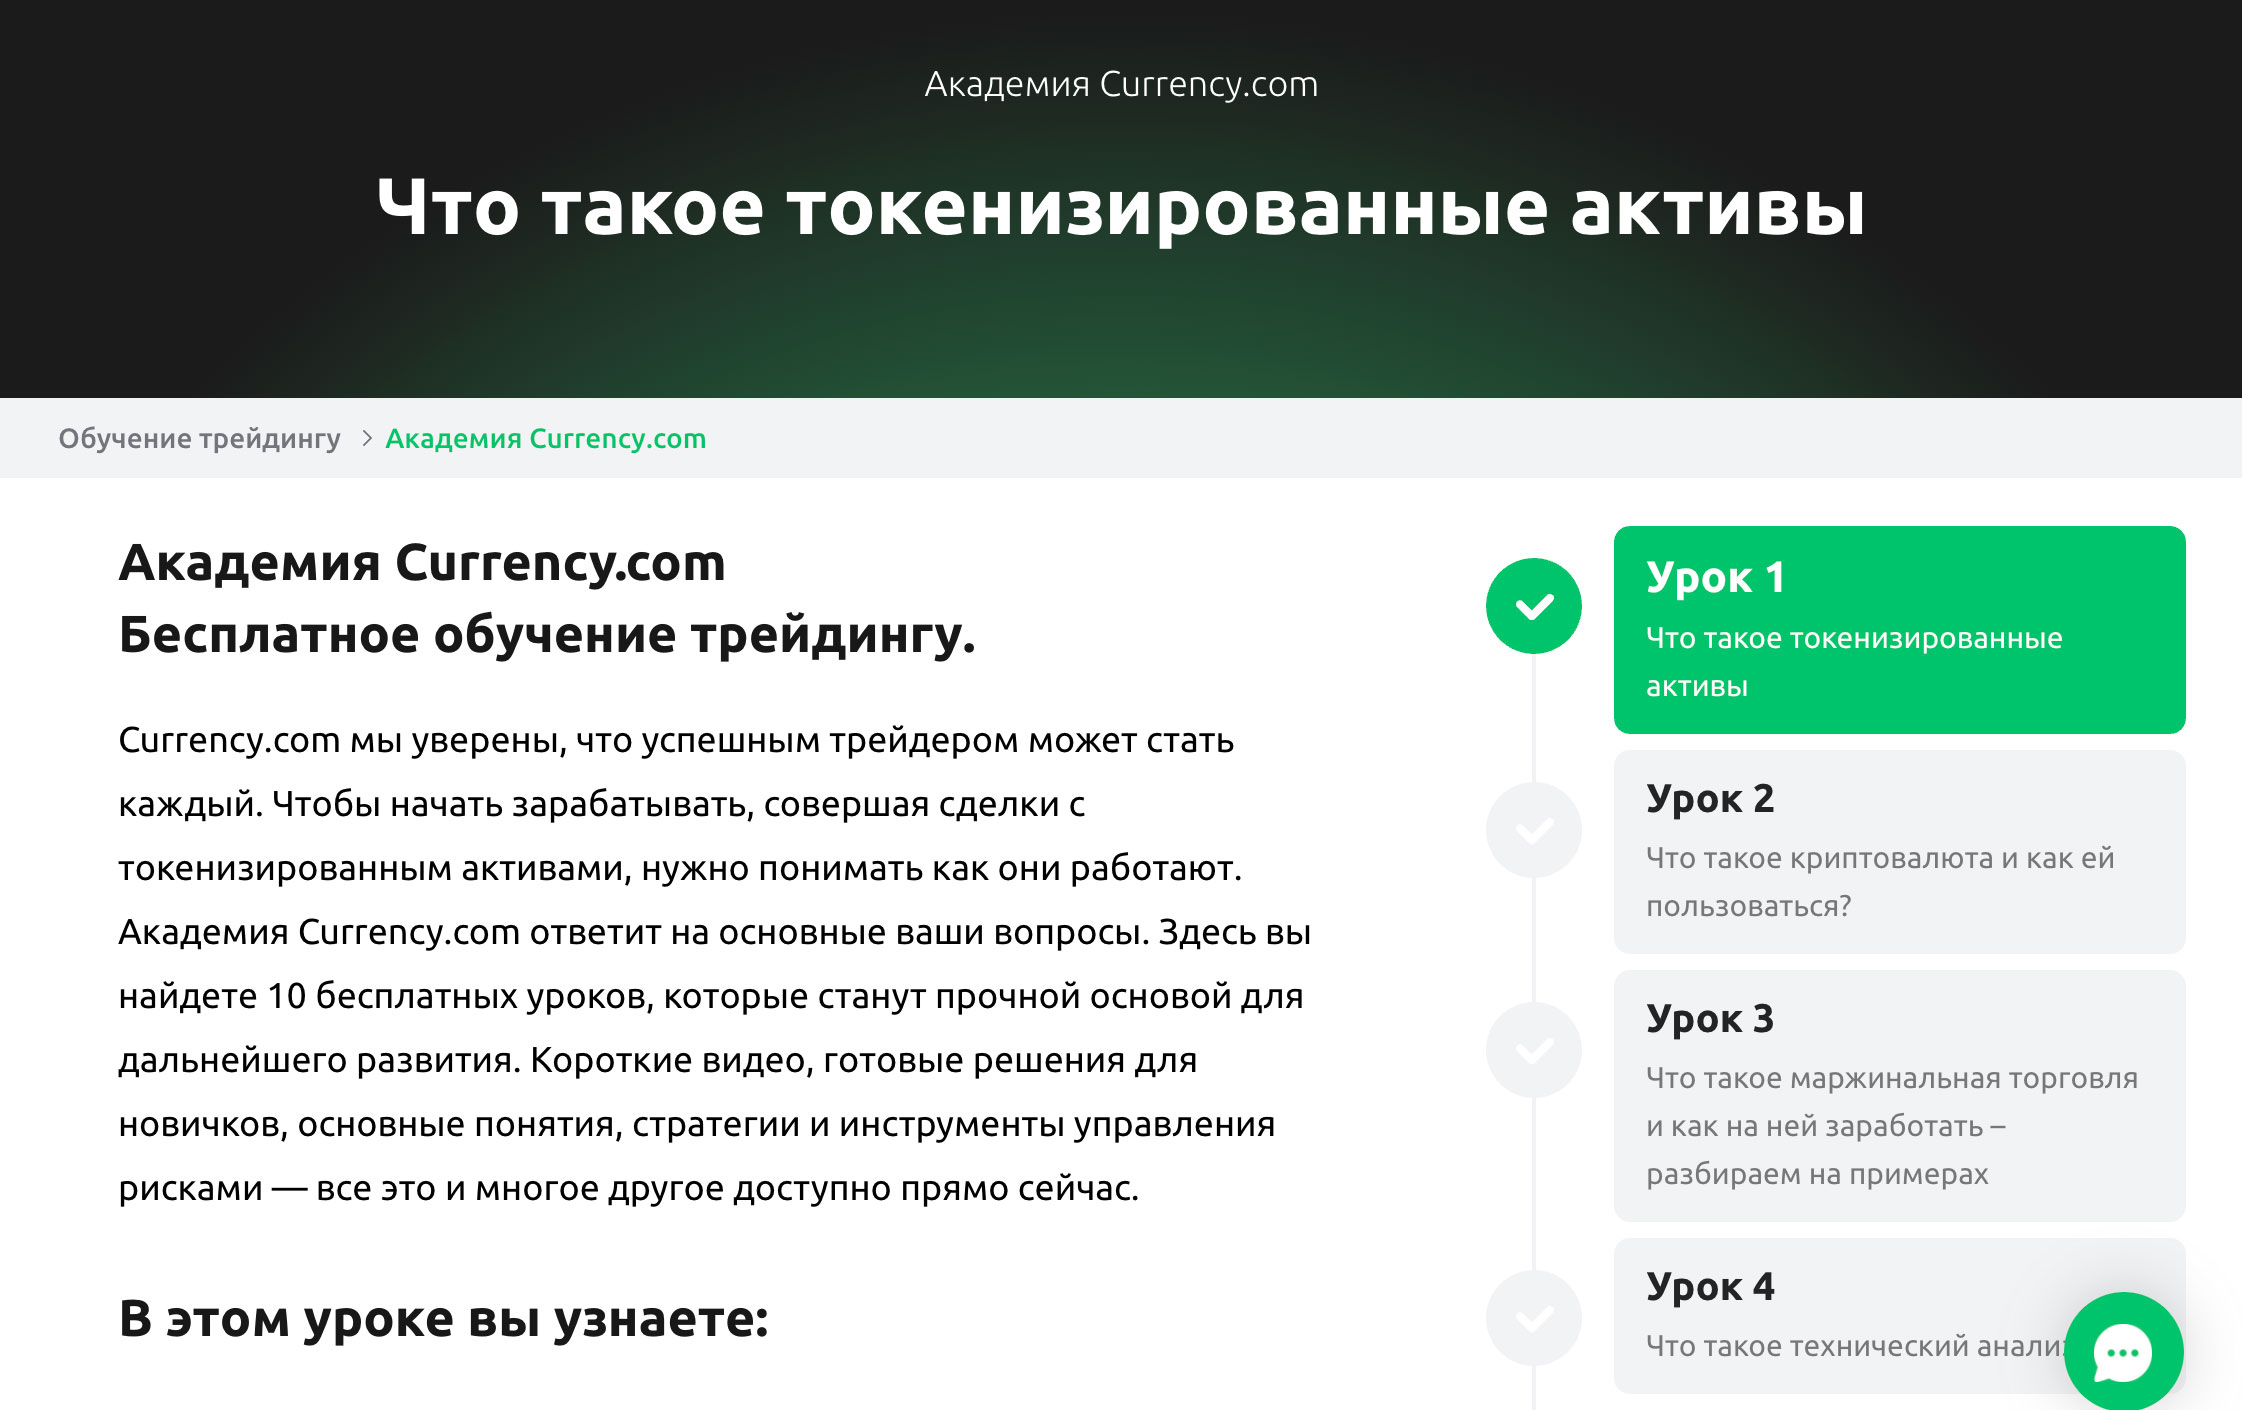 академия currency